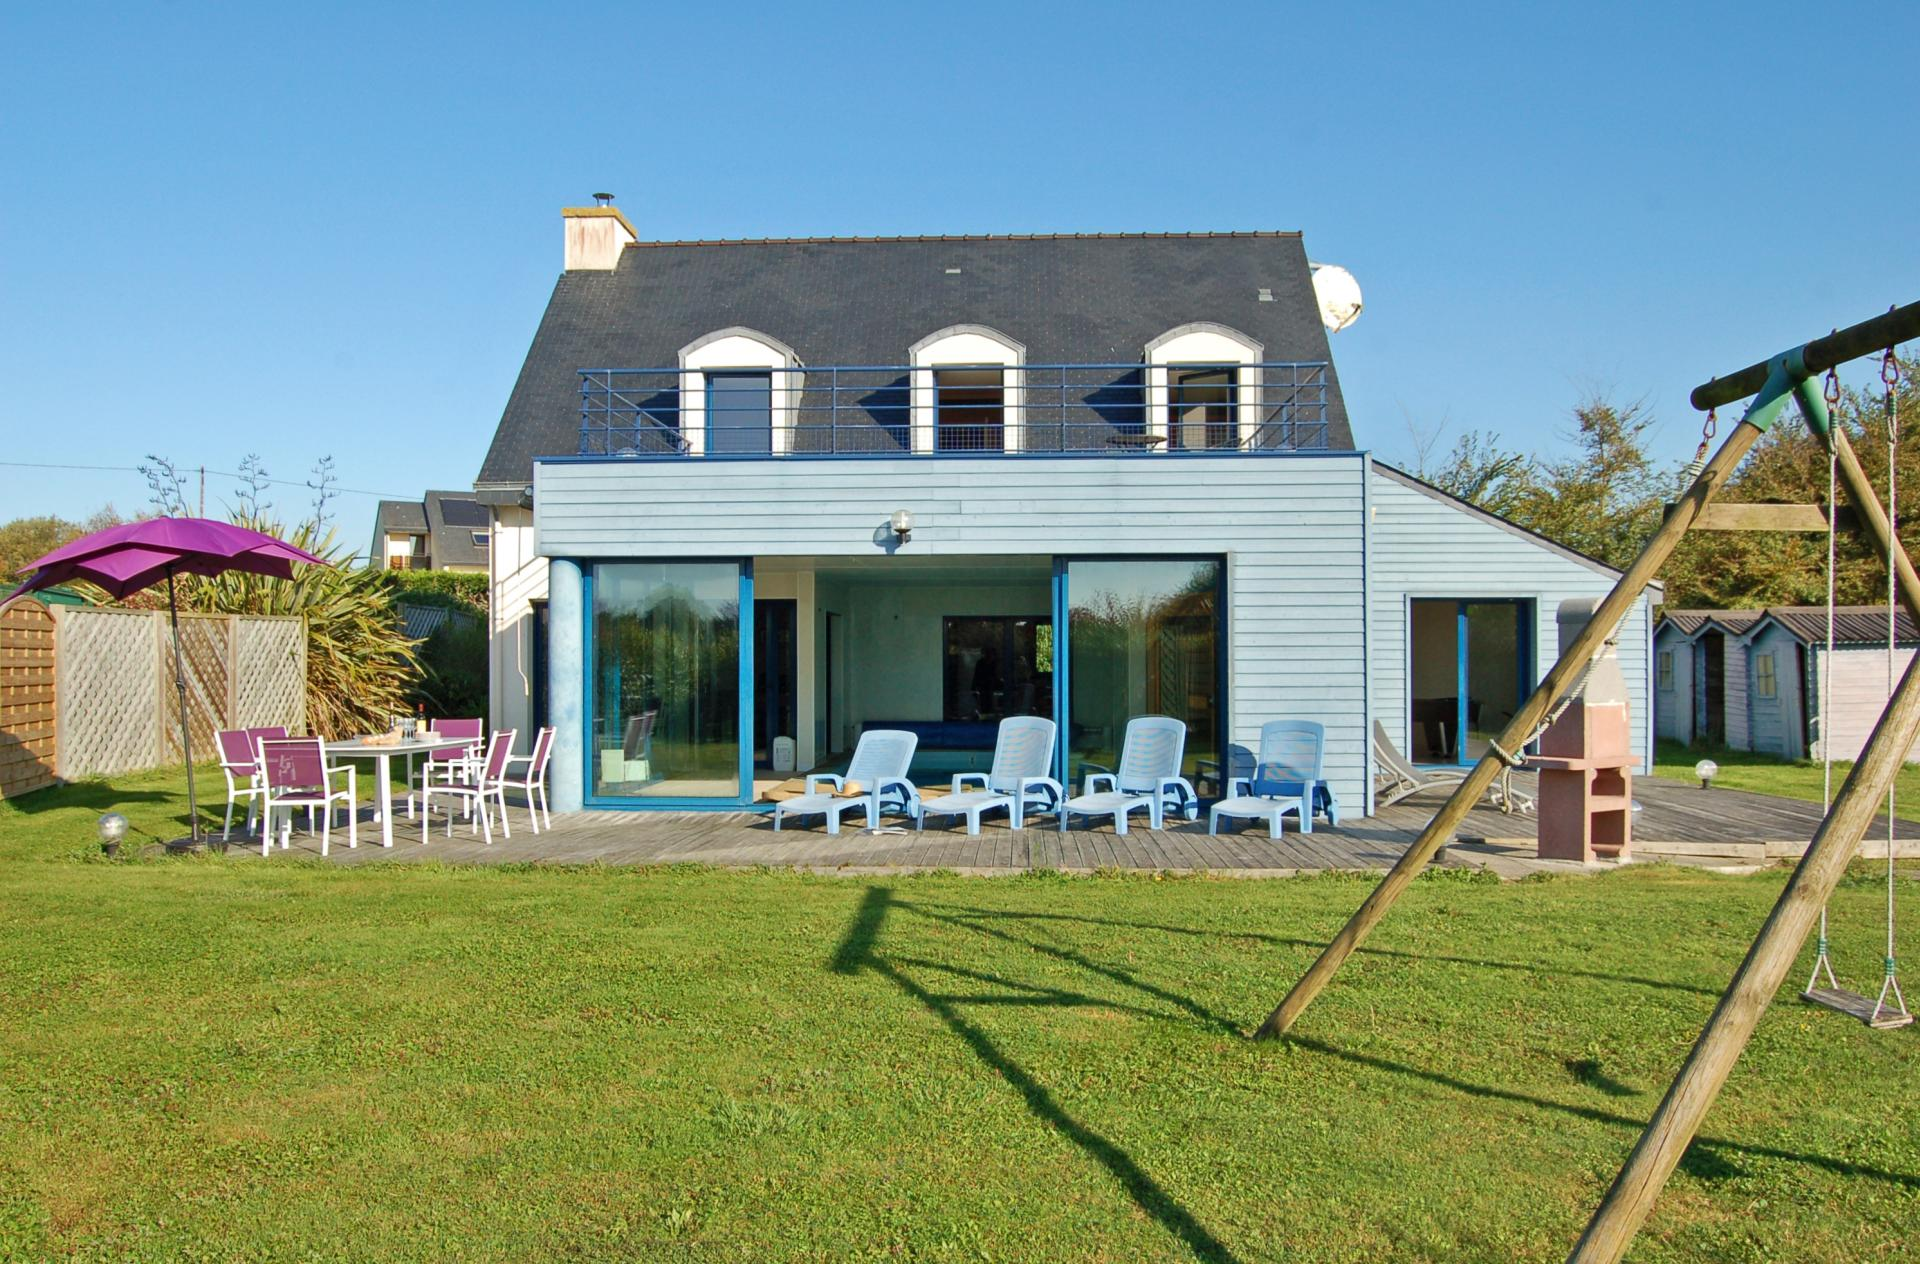 Property exterior, Annick, Brittany, Moelan-sur-mer.